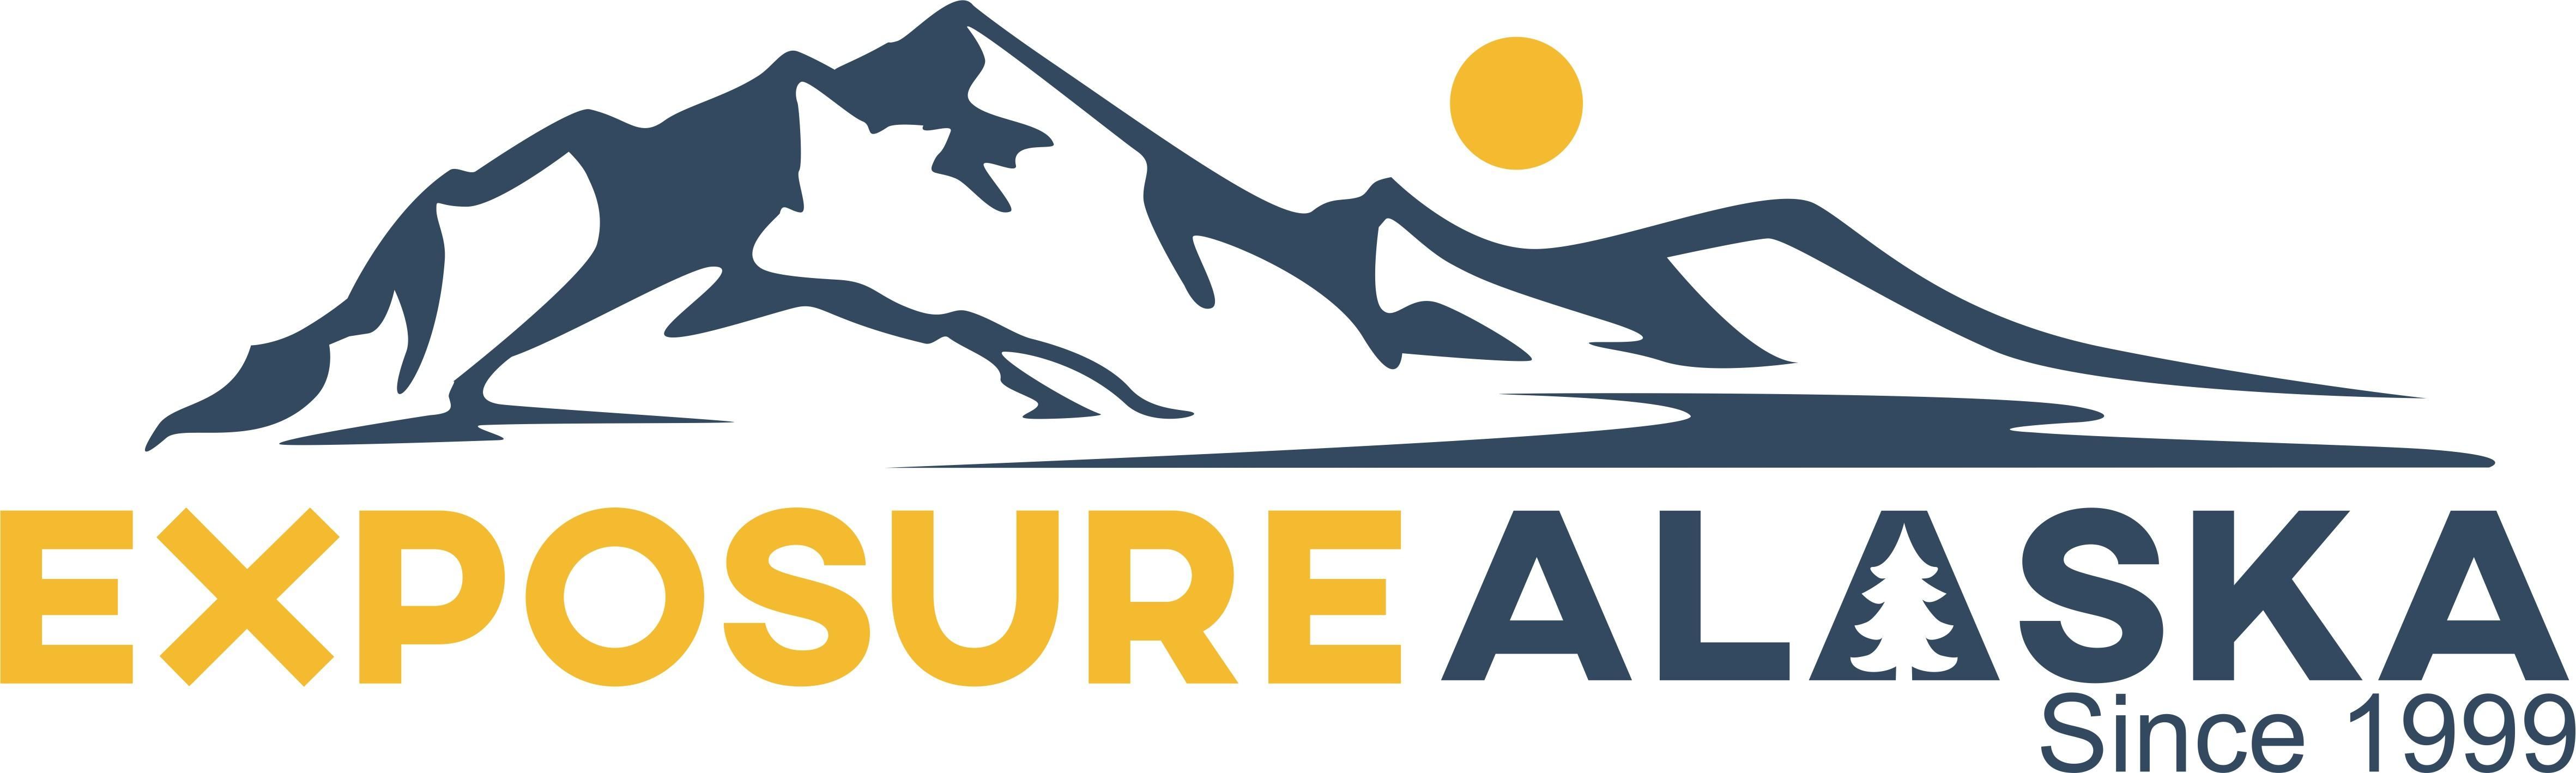 New adventurous logo for Alaska adventure company